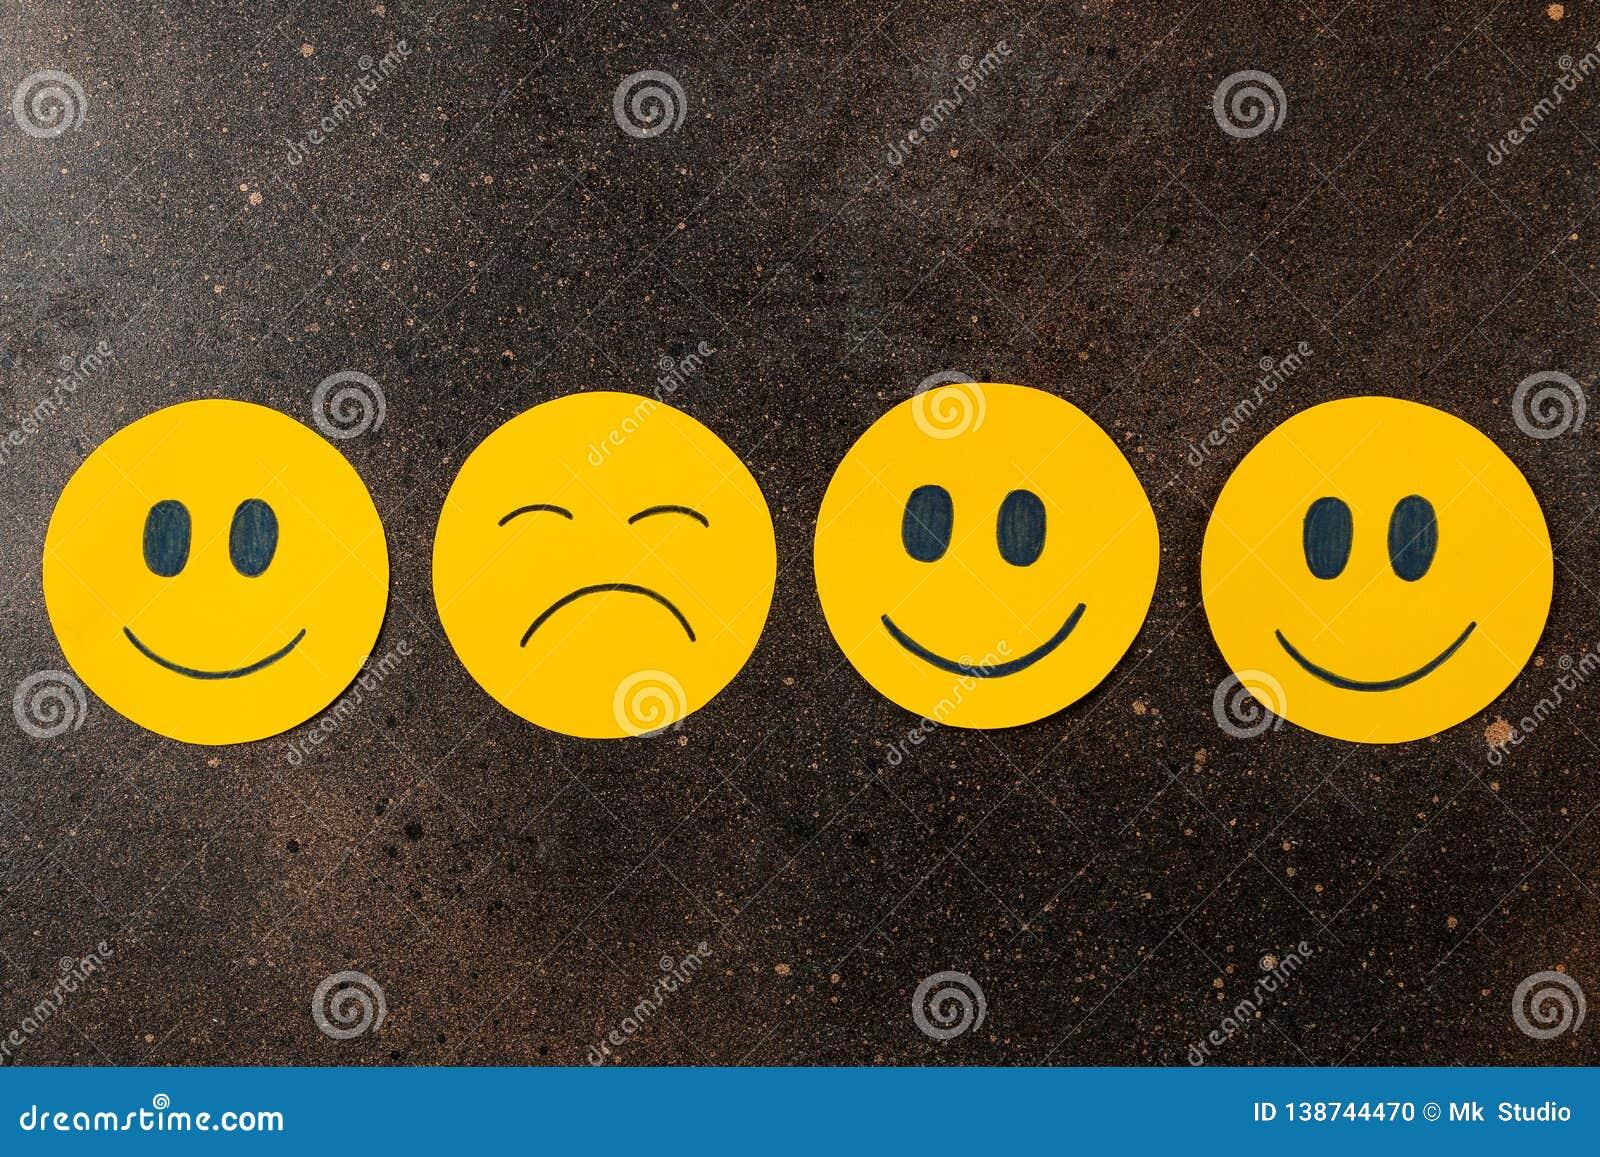 Depression Concept  Sad Smiley Among Funny Smileys On A Dark